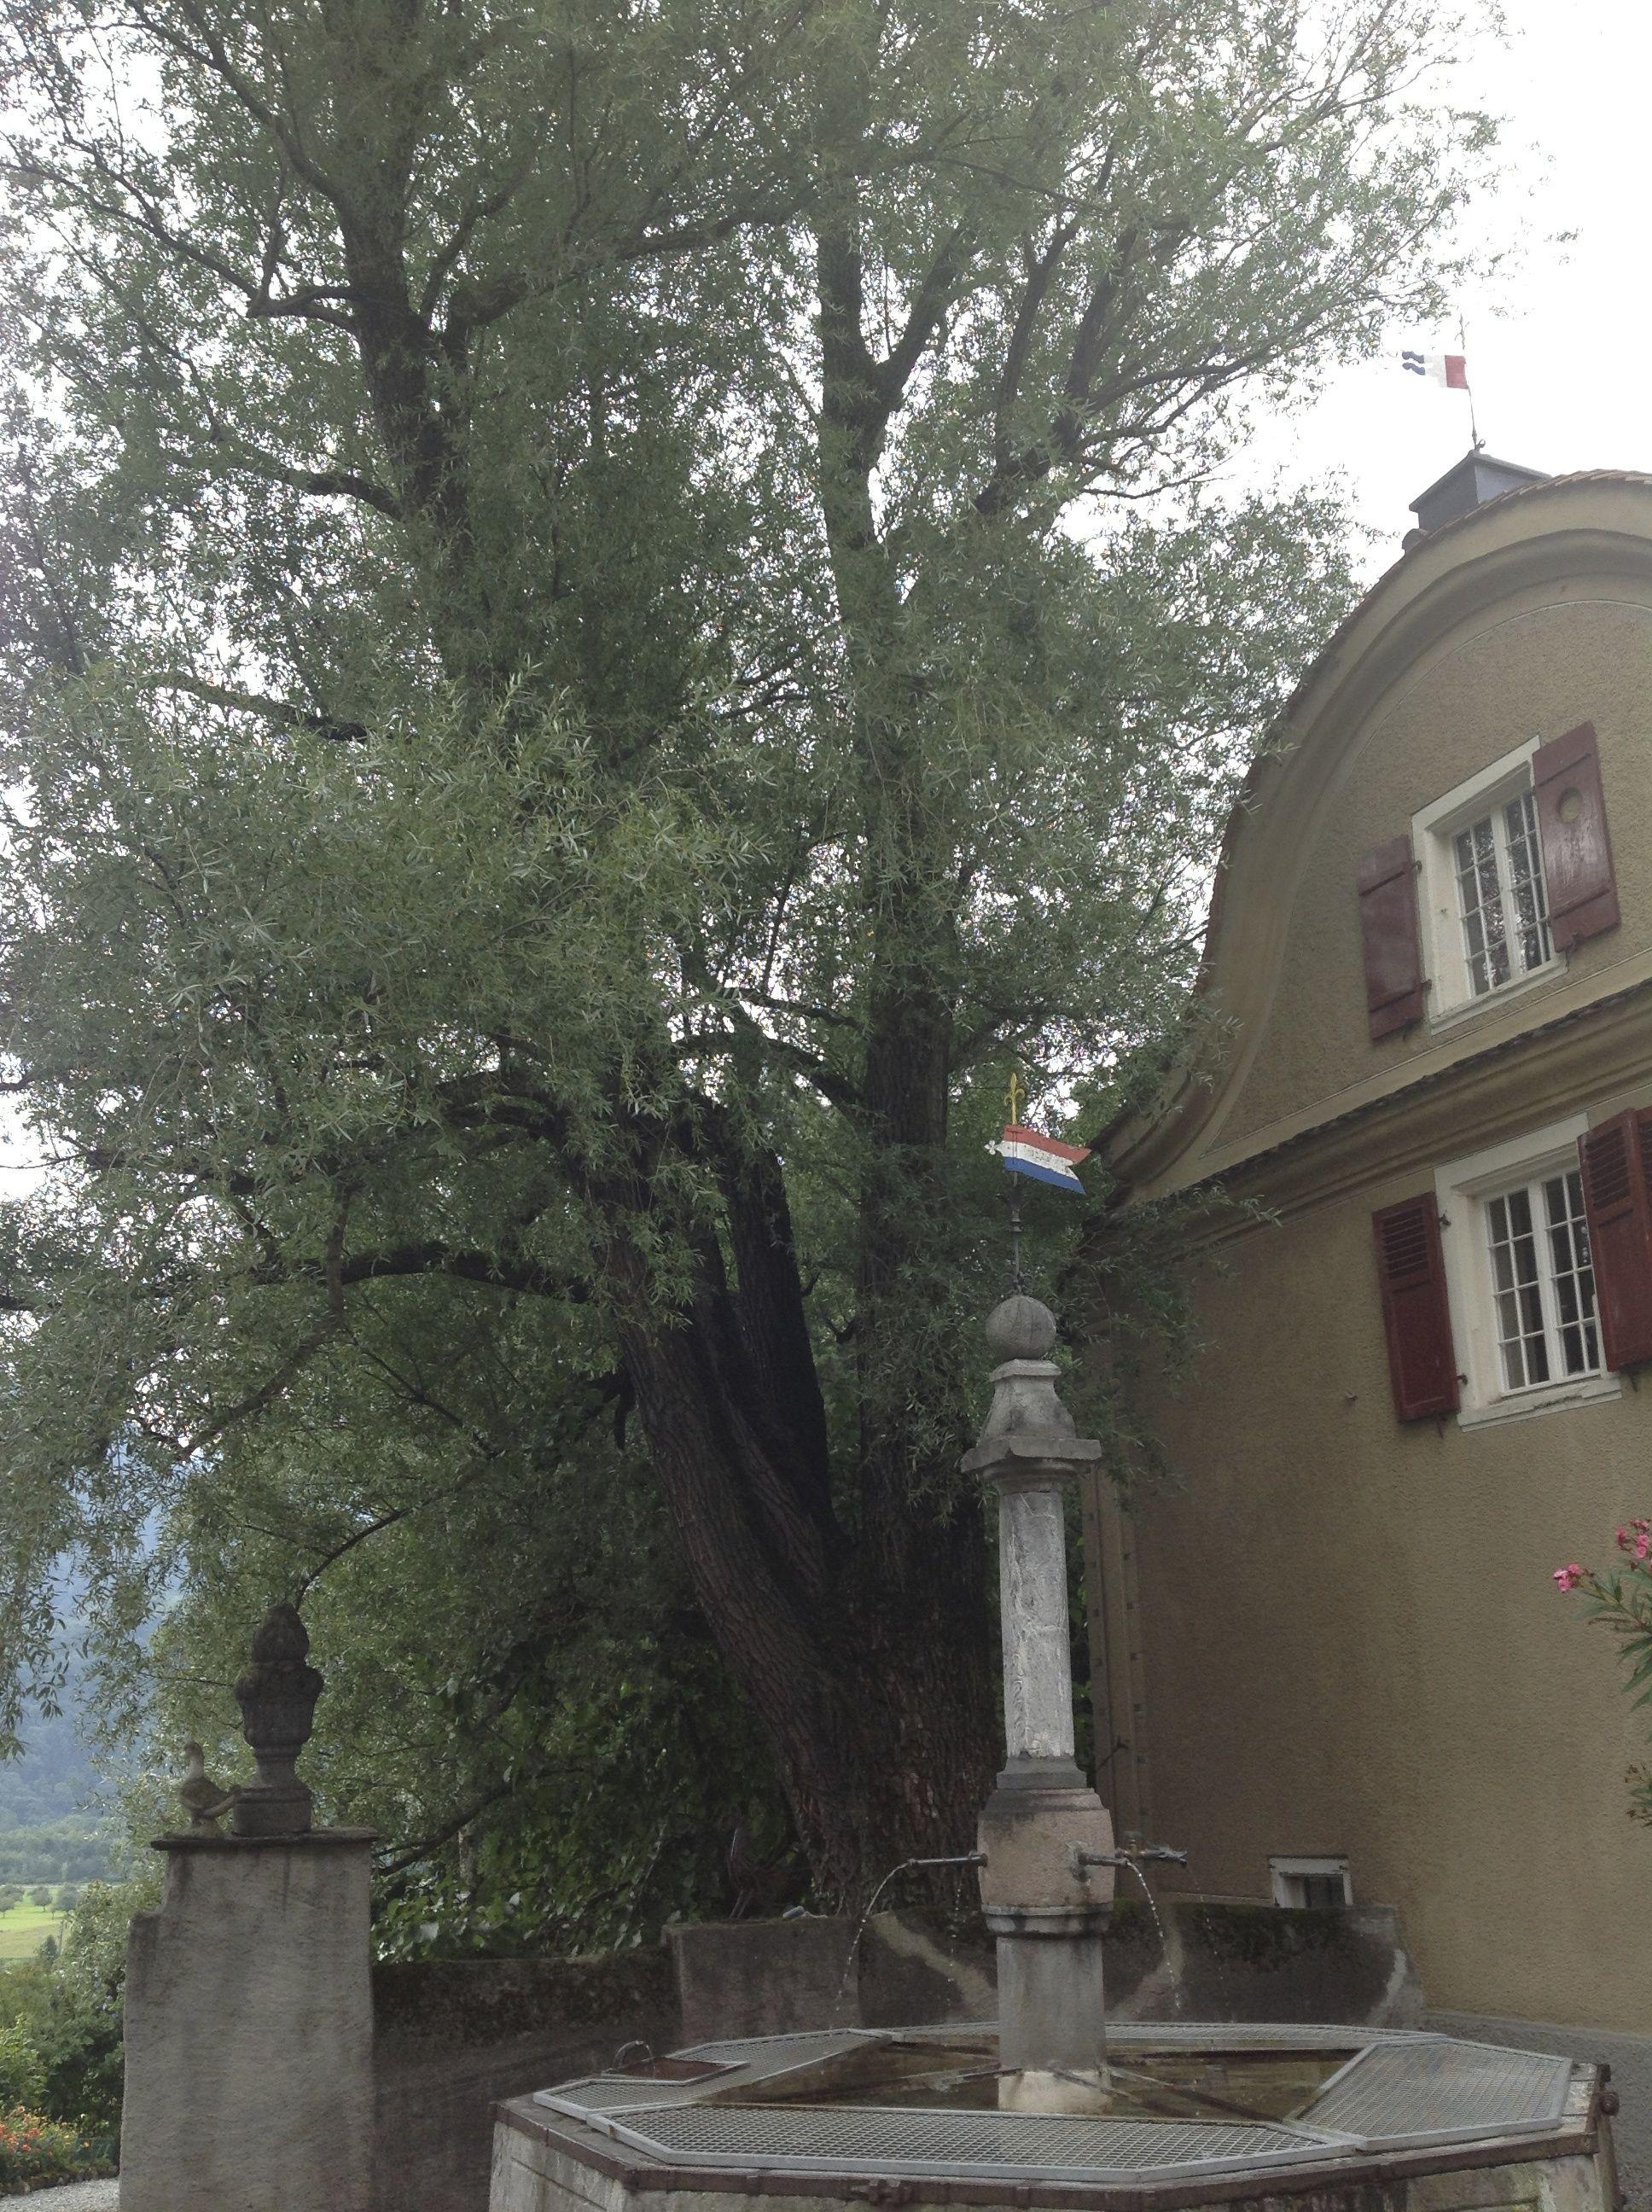 Willow (Salix) Tree in Schloss Salenegg Courtyard (Photo Patrick Hunt, 2013)